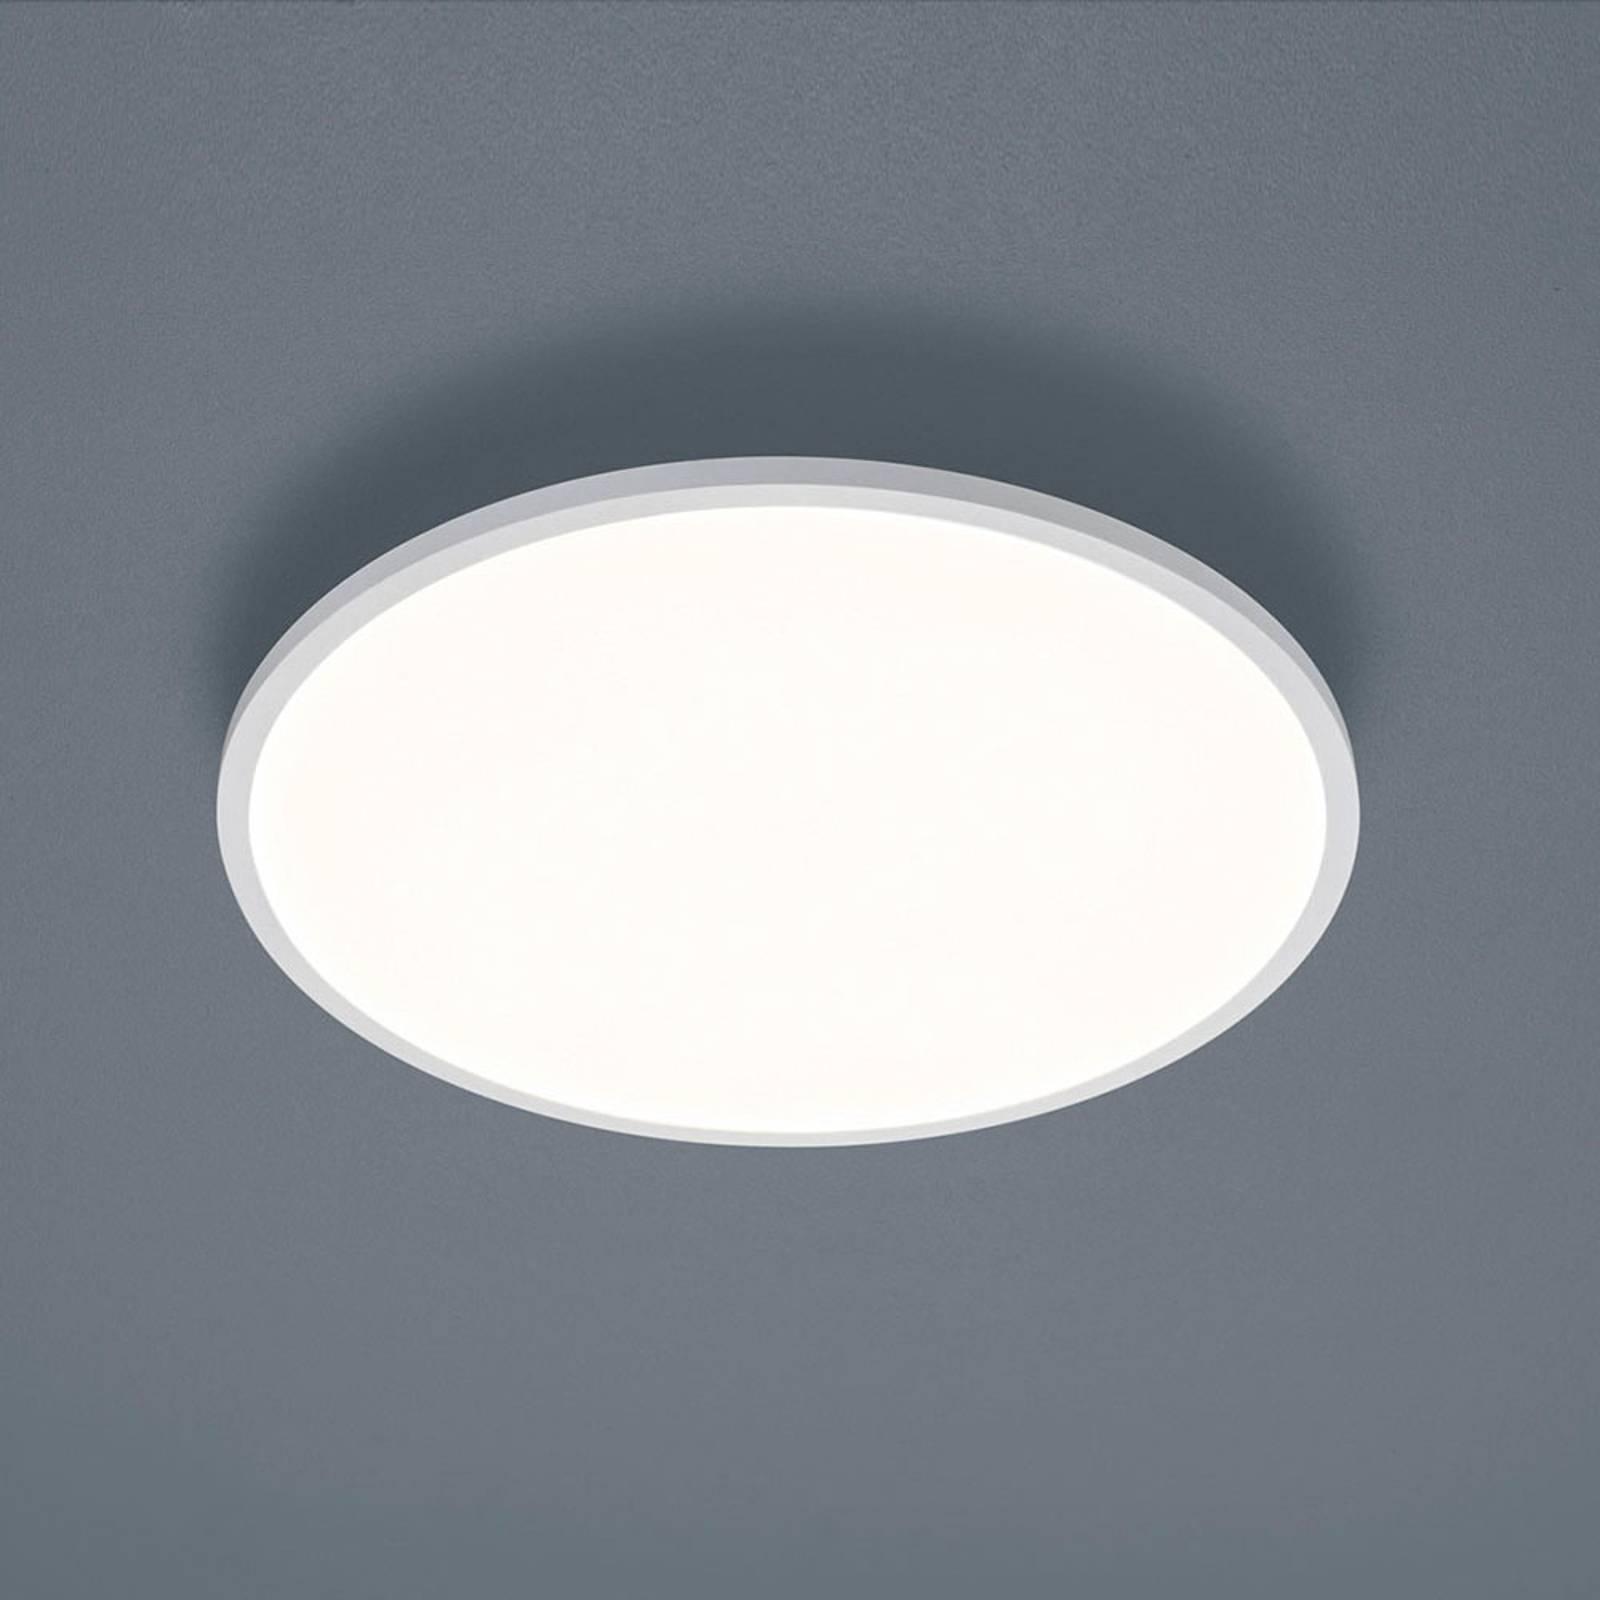 Helestra Rack LED plafondlamp dimbaar rond wit